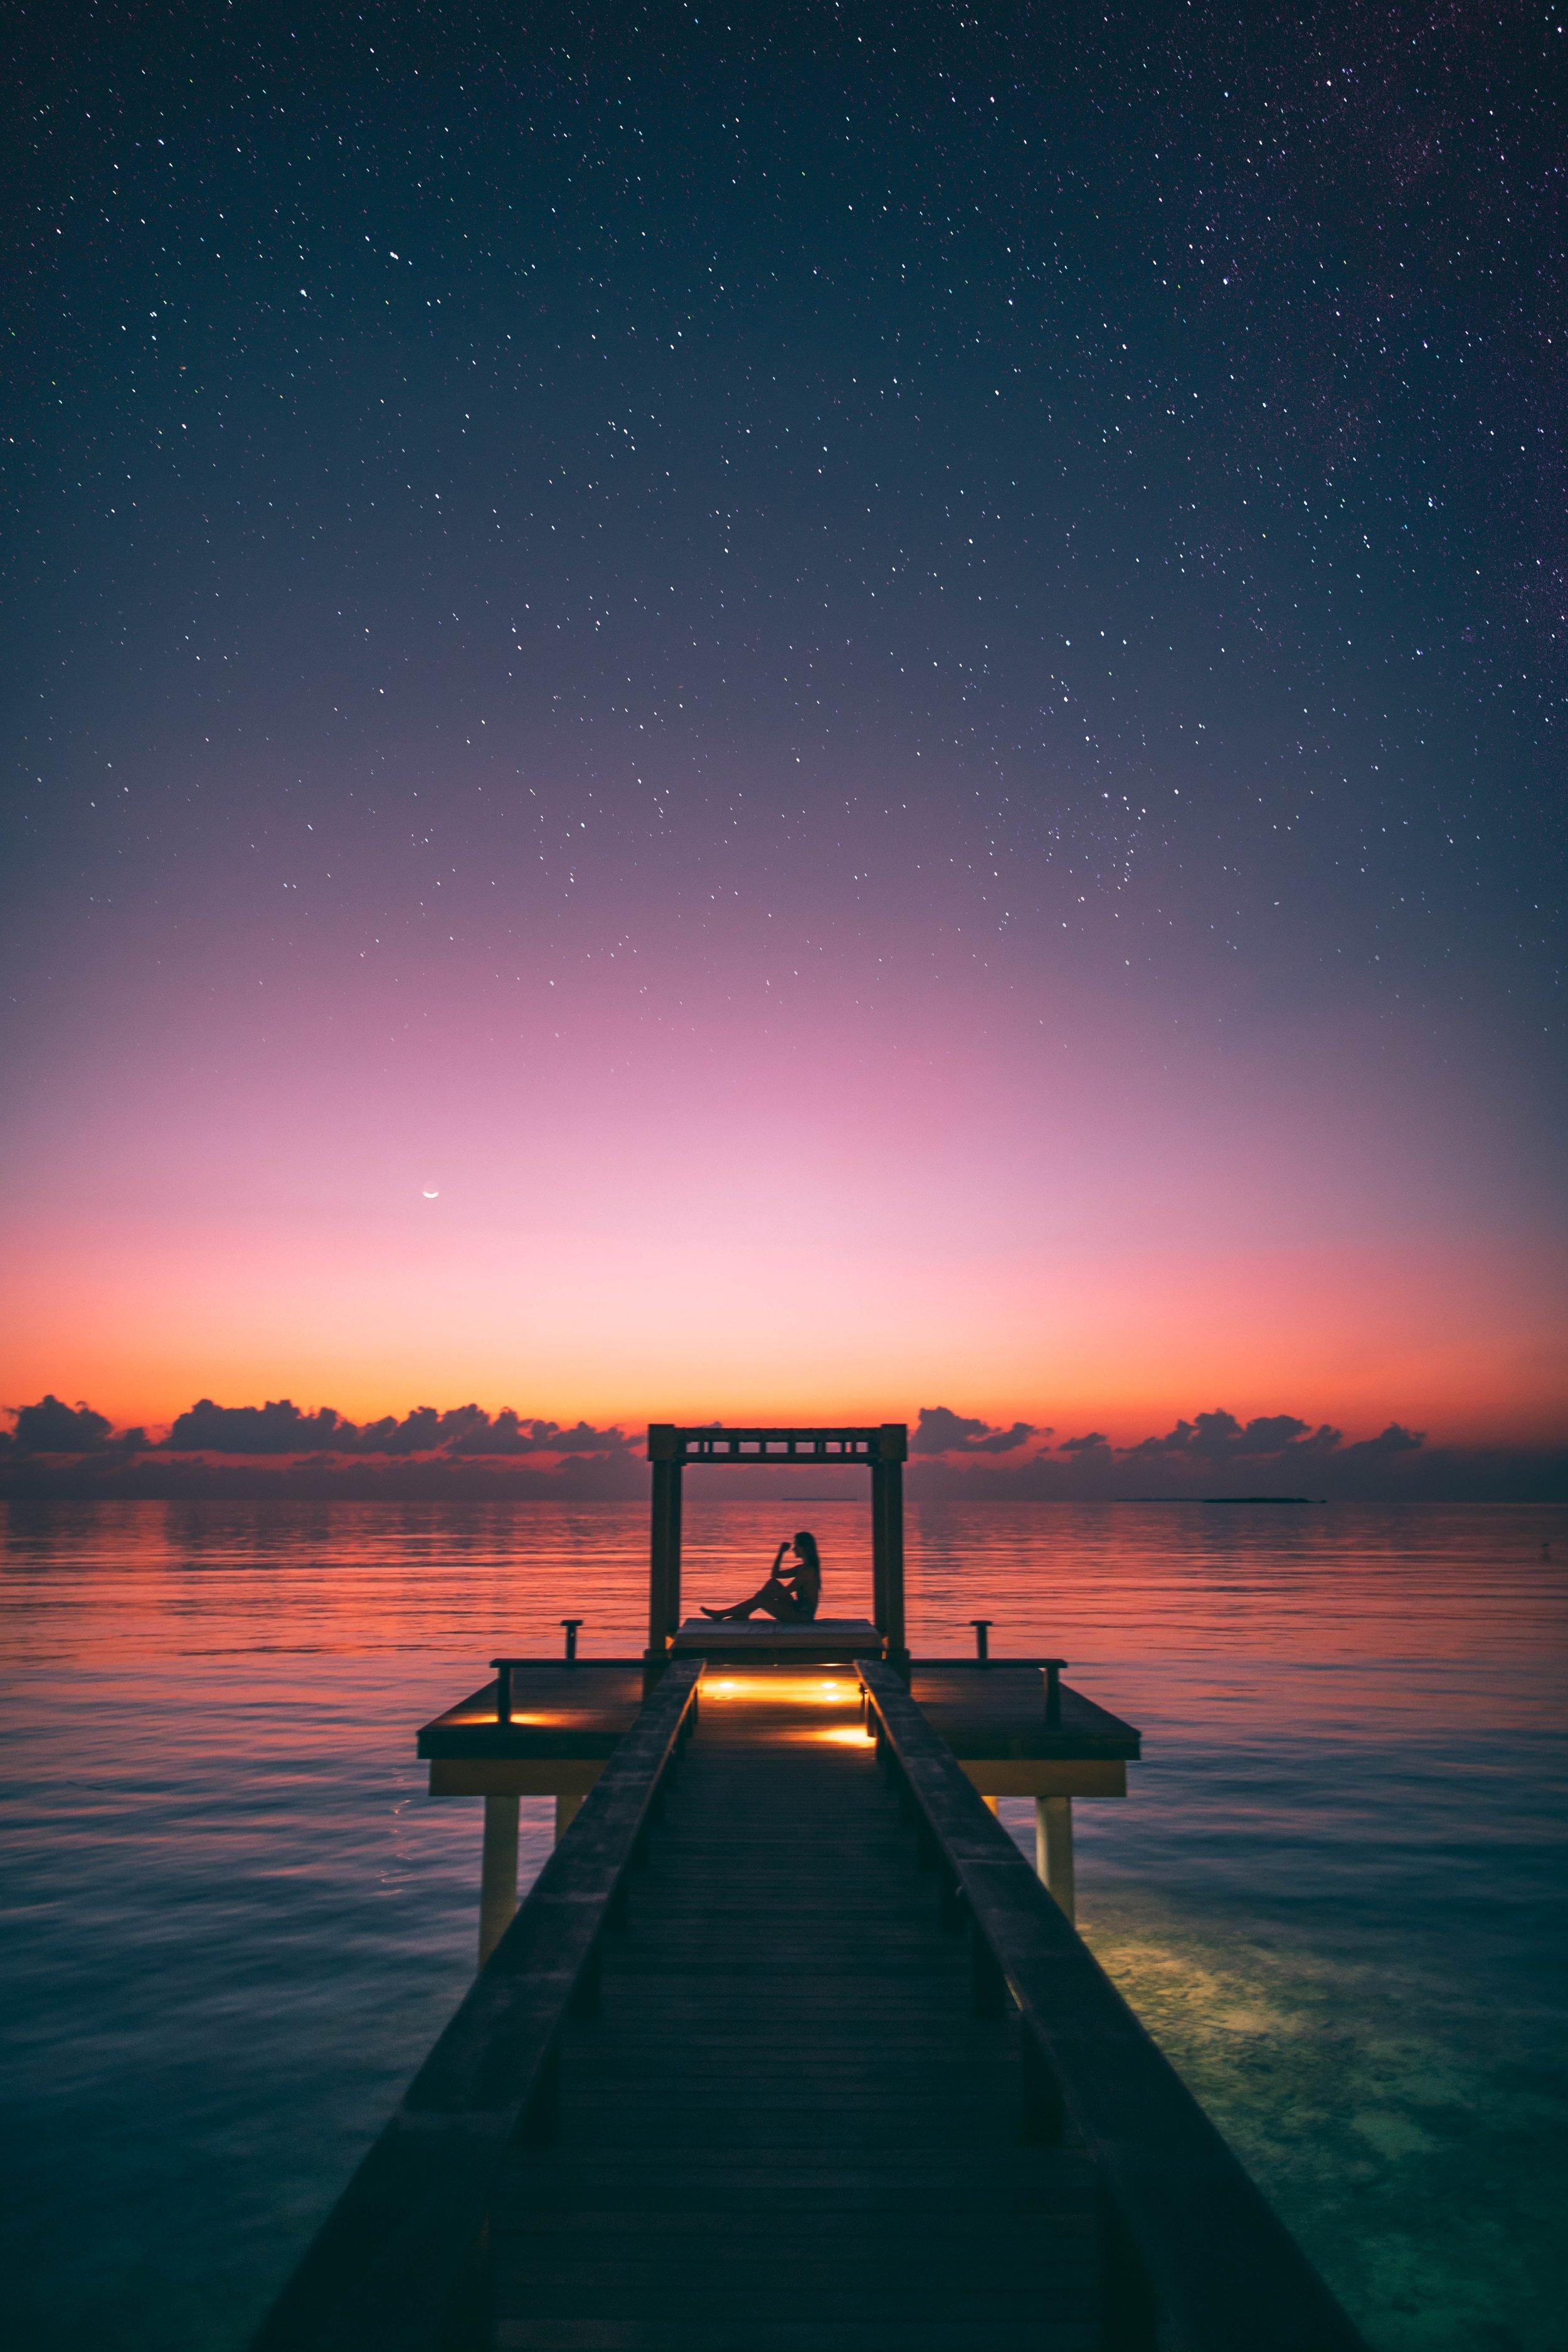 boardwalk-dawn-dock-2531237.jpg